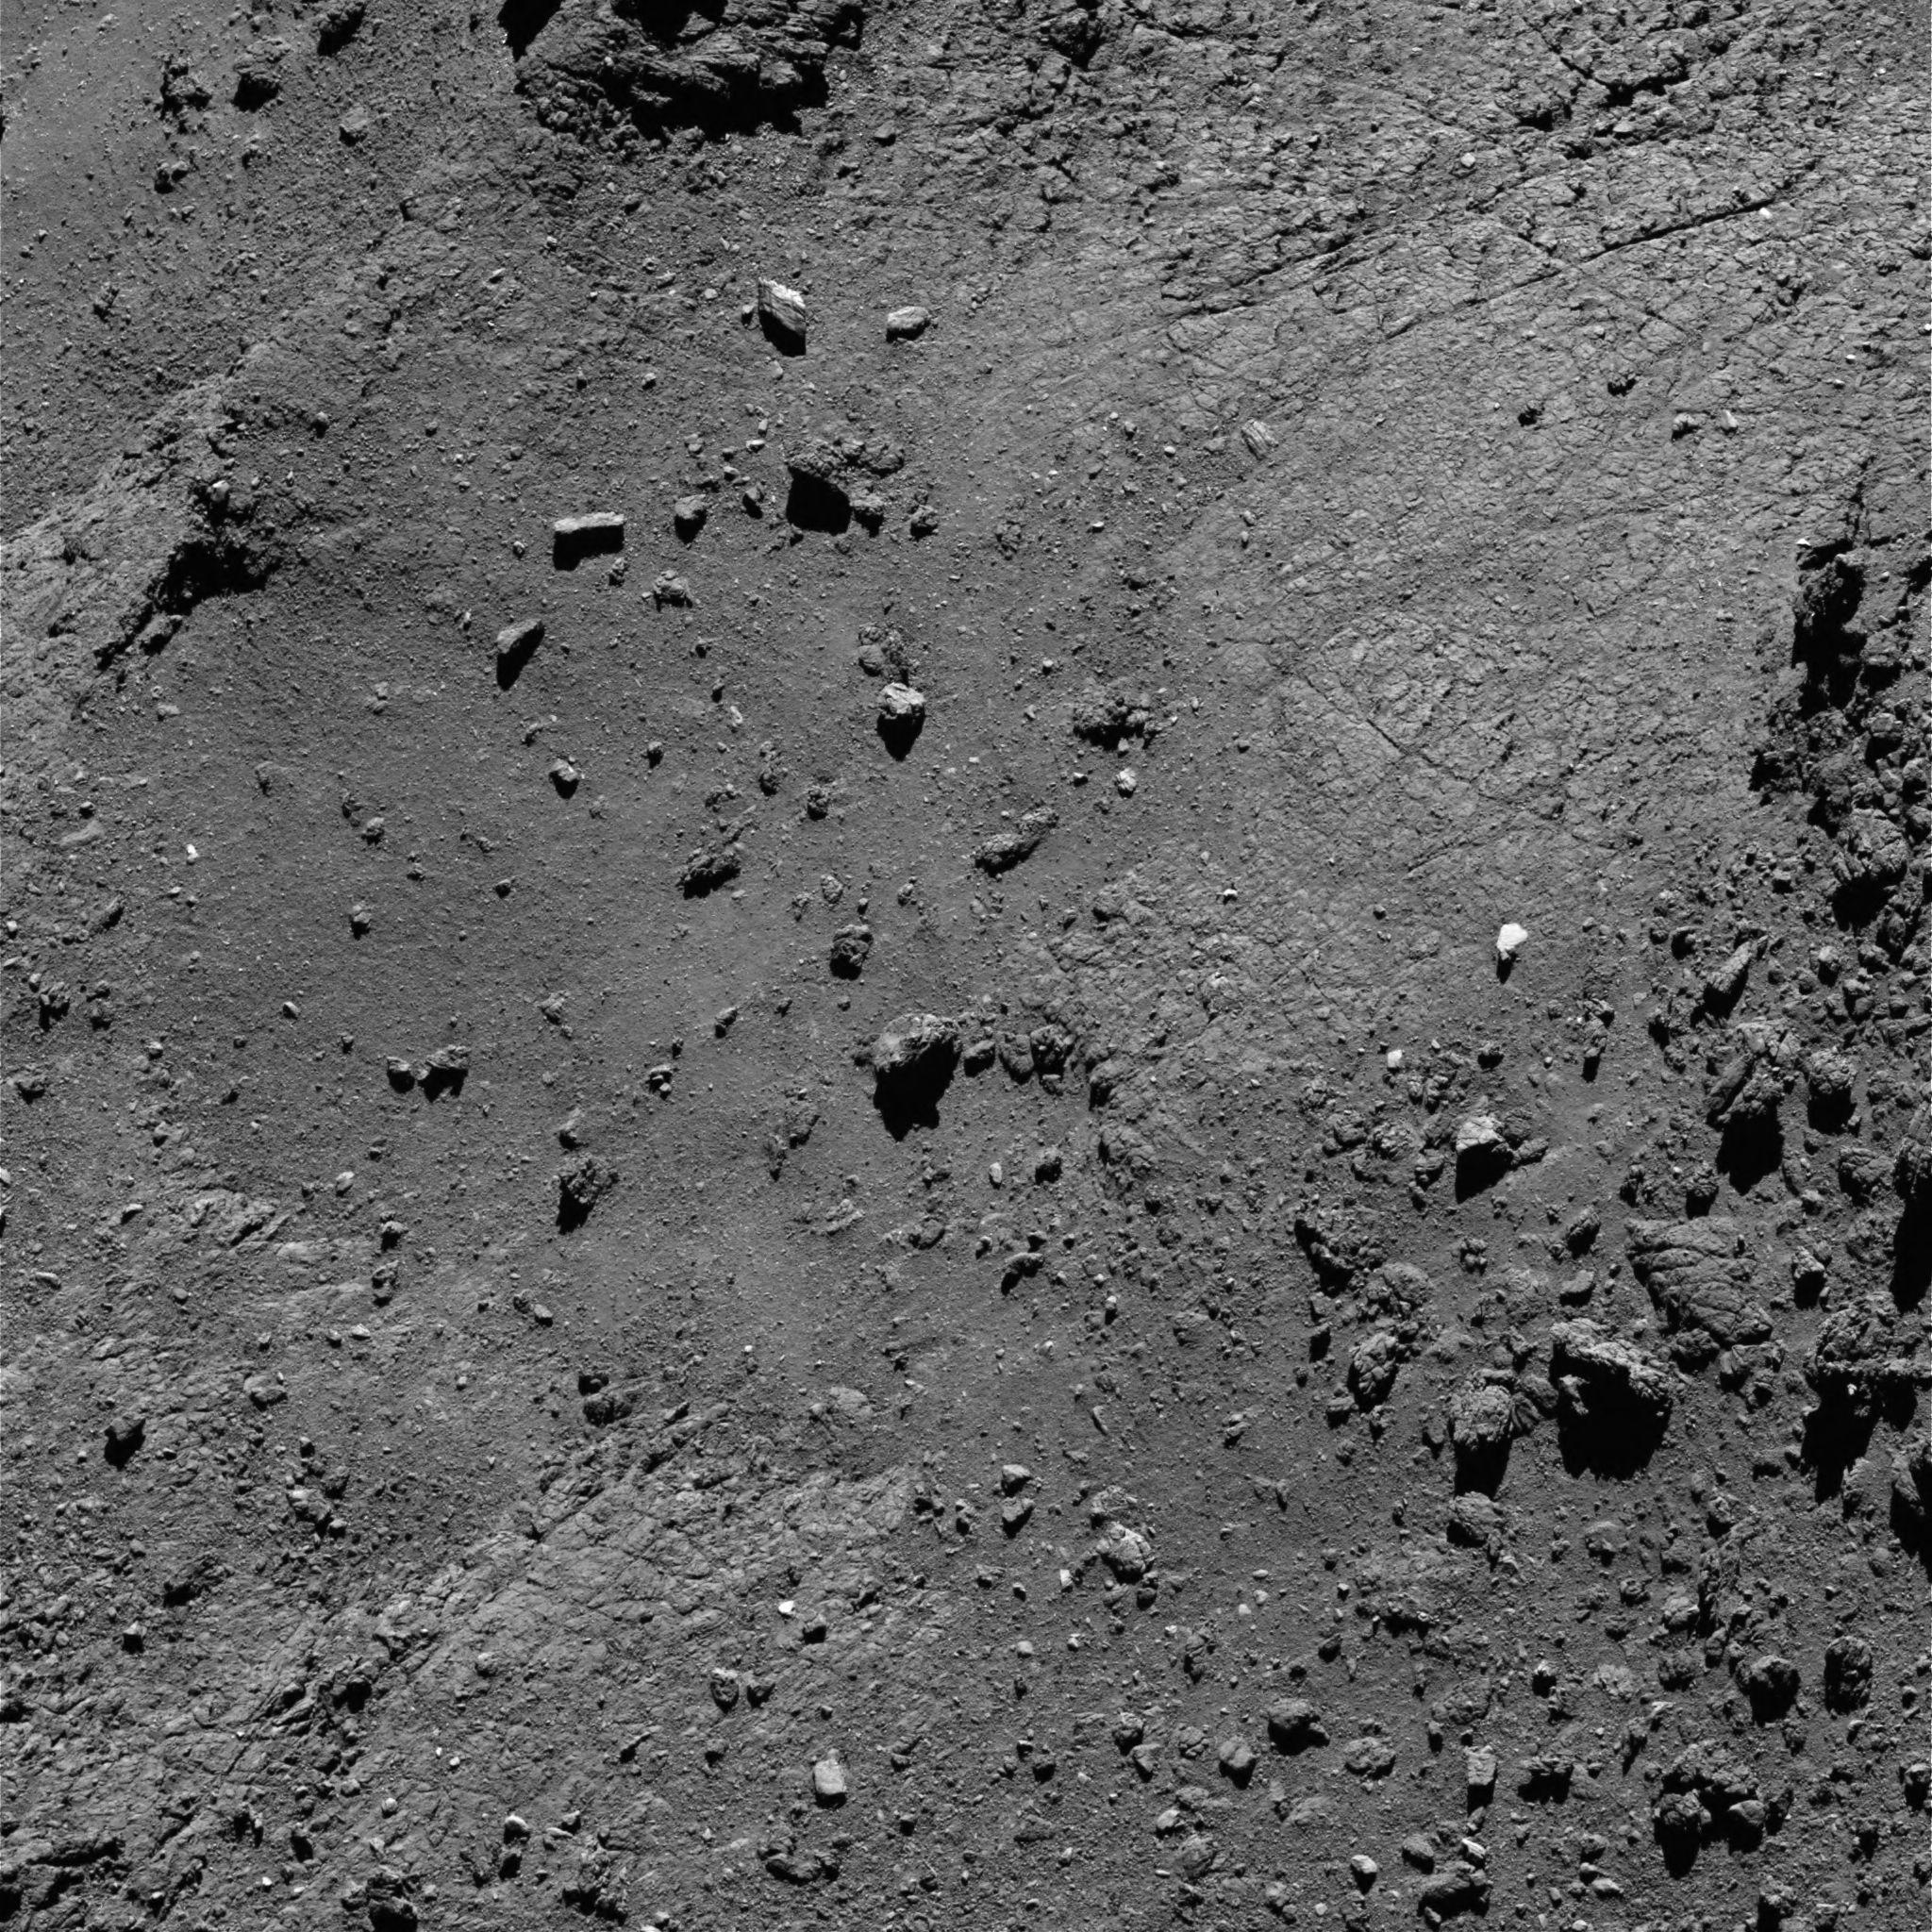 1567215487395-Rosetta_OSIRIS_NAC_comet_67P_20160815T193748.jpg